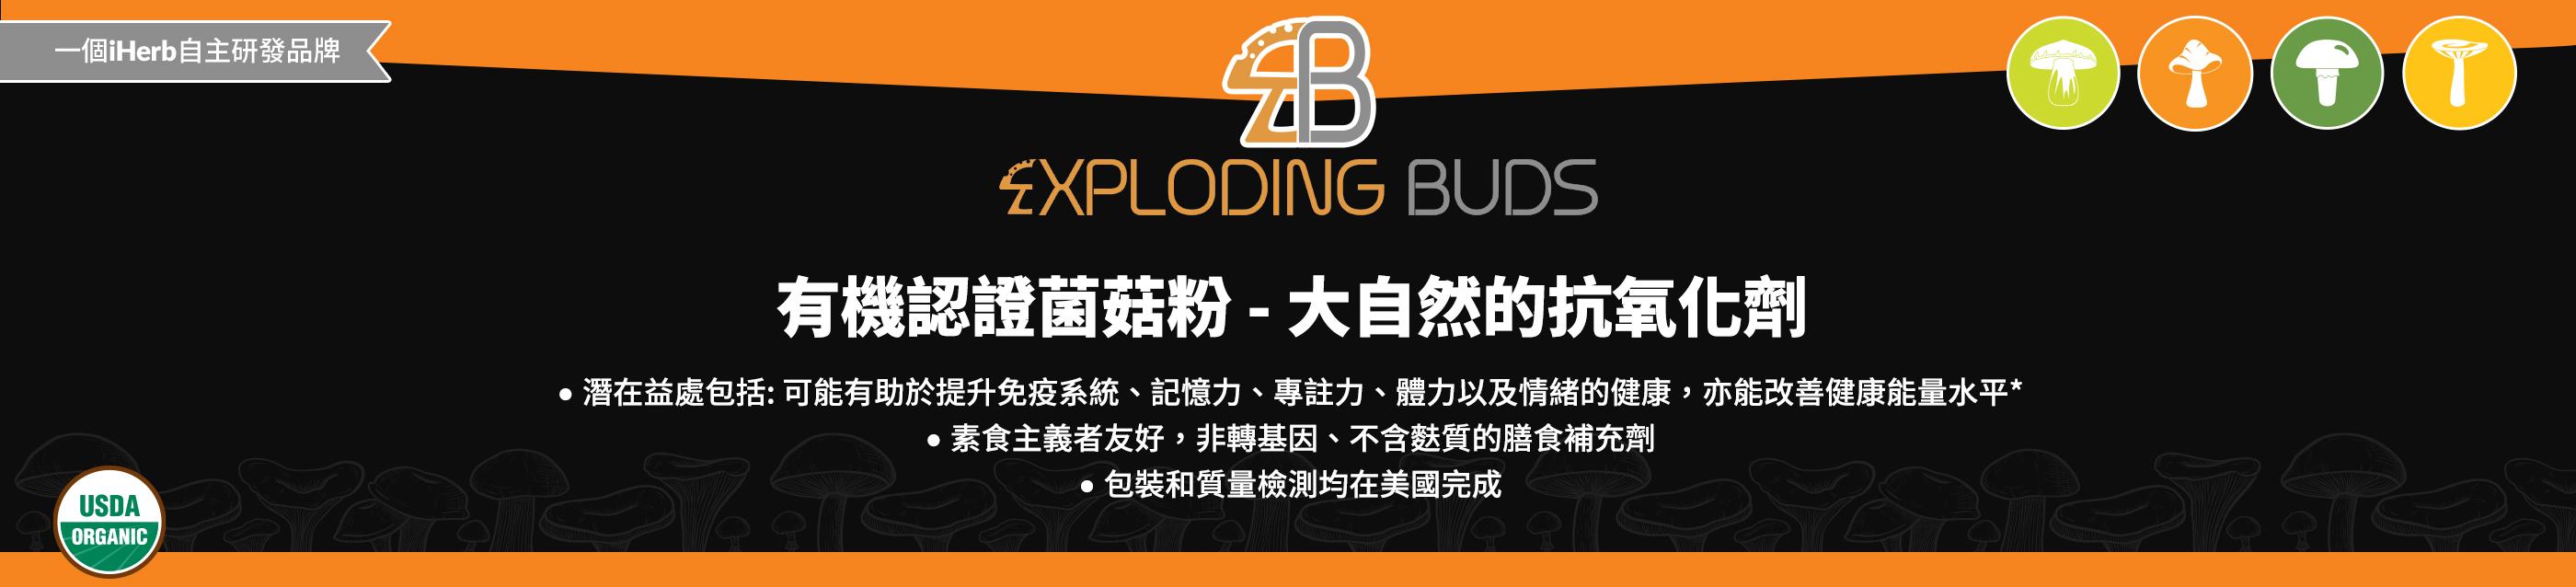 Exploding Buds